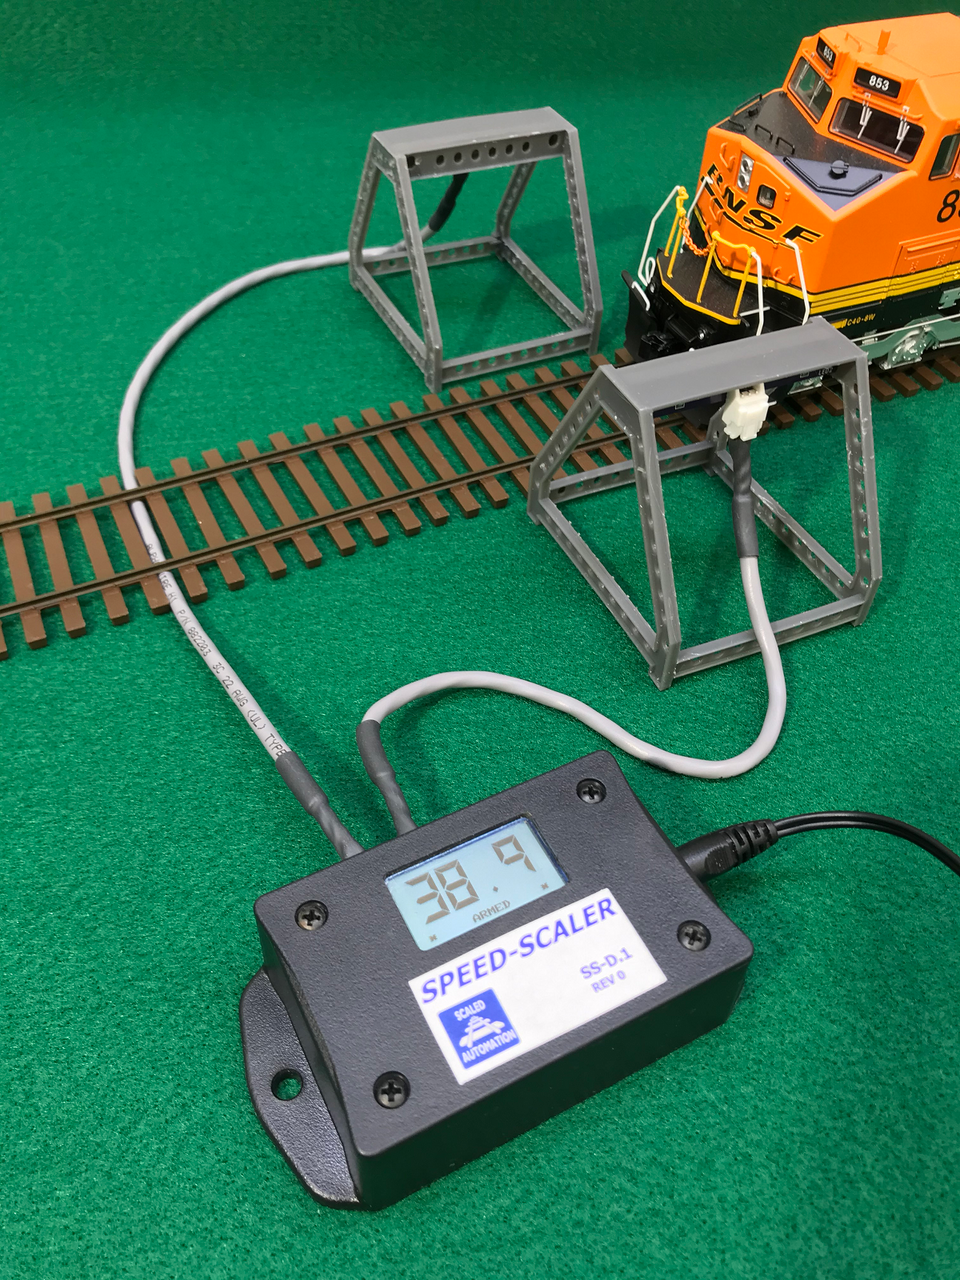 Speed-Scaler